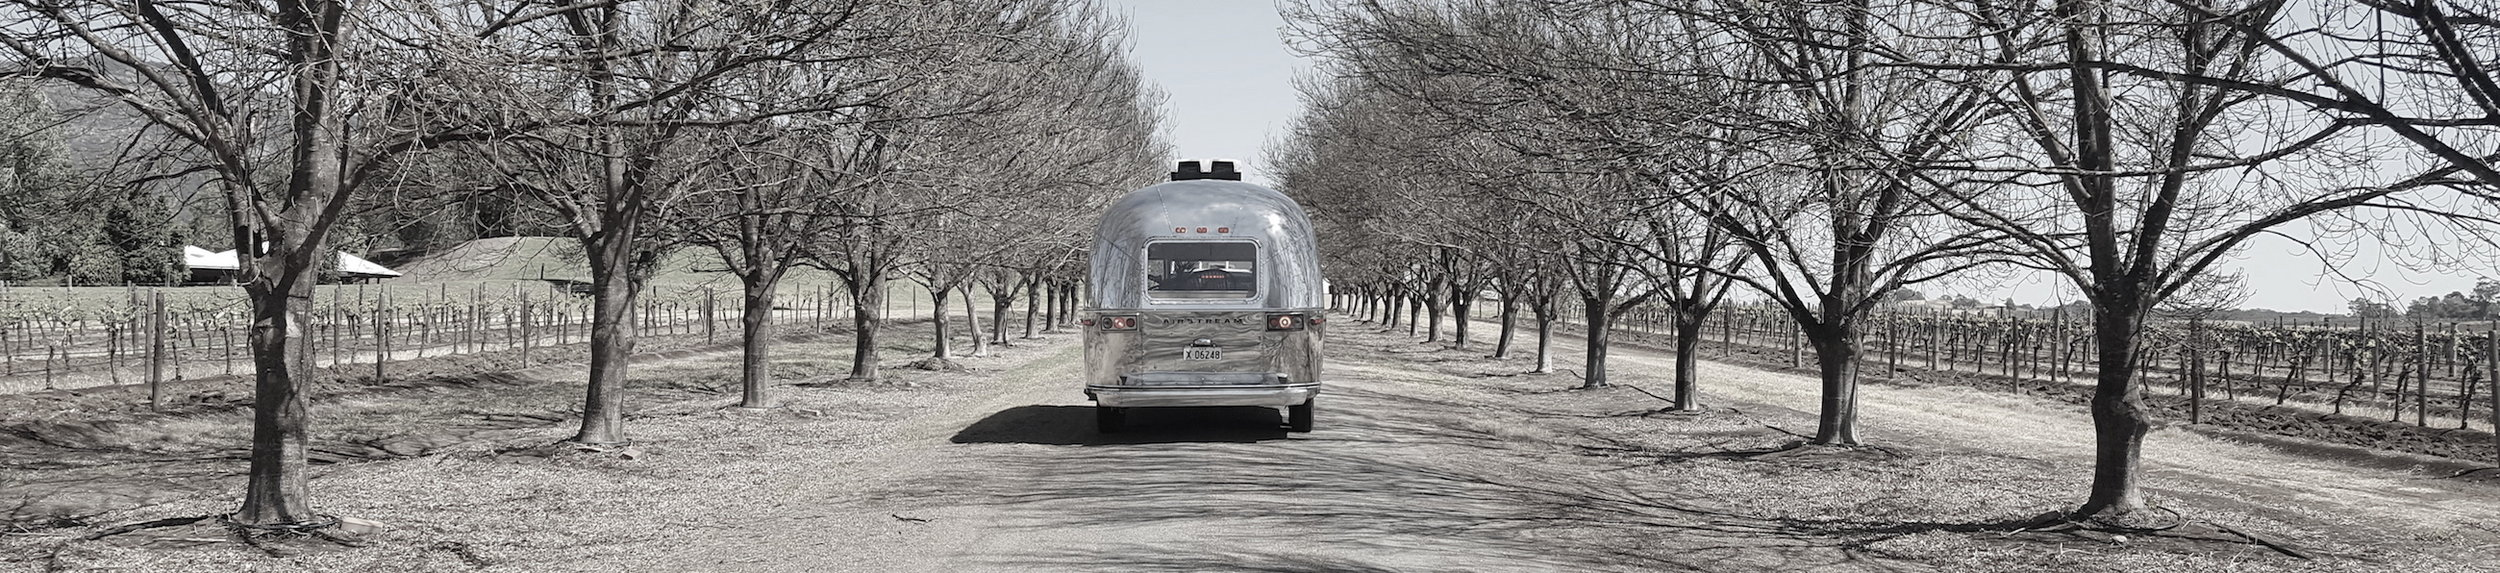 TAS_exterior_scaraborough driveway_wideshot_rear_l_sml_b-w.jpg